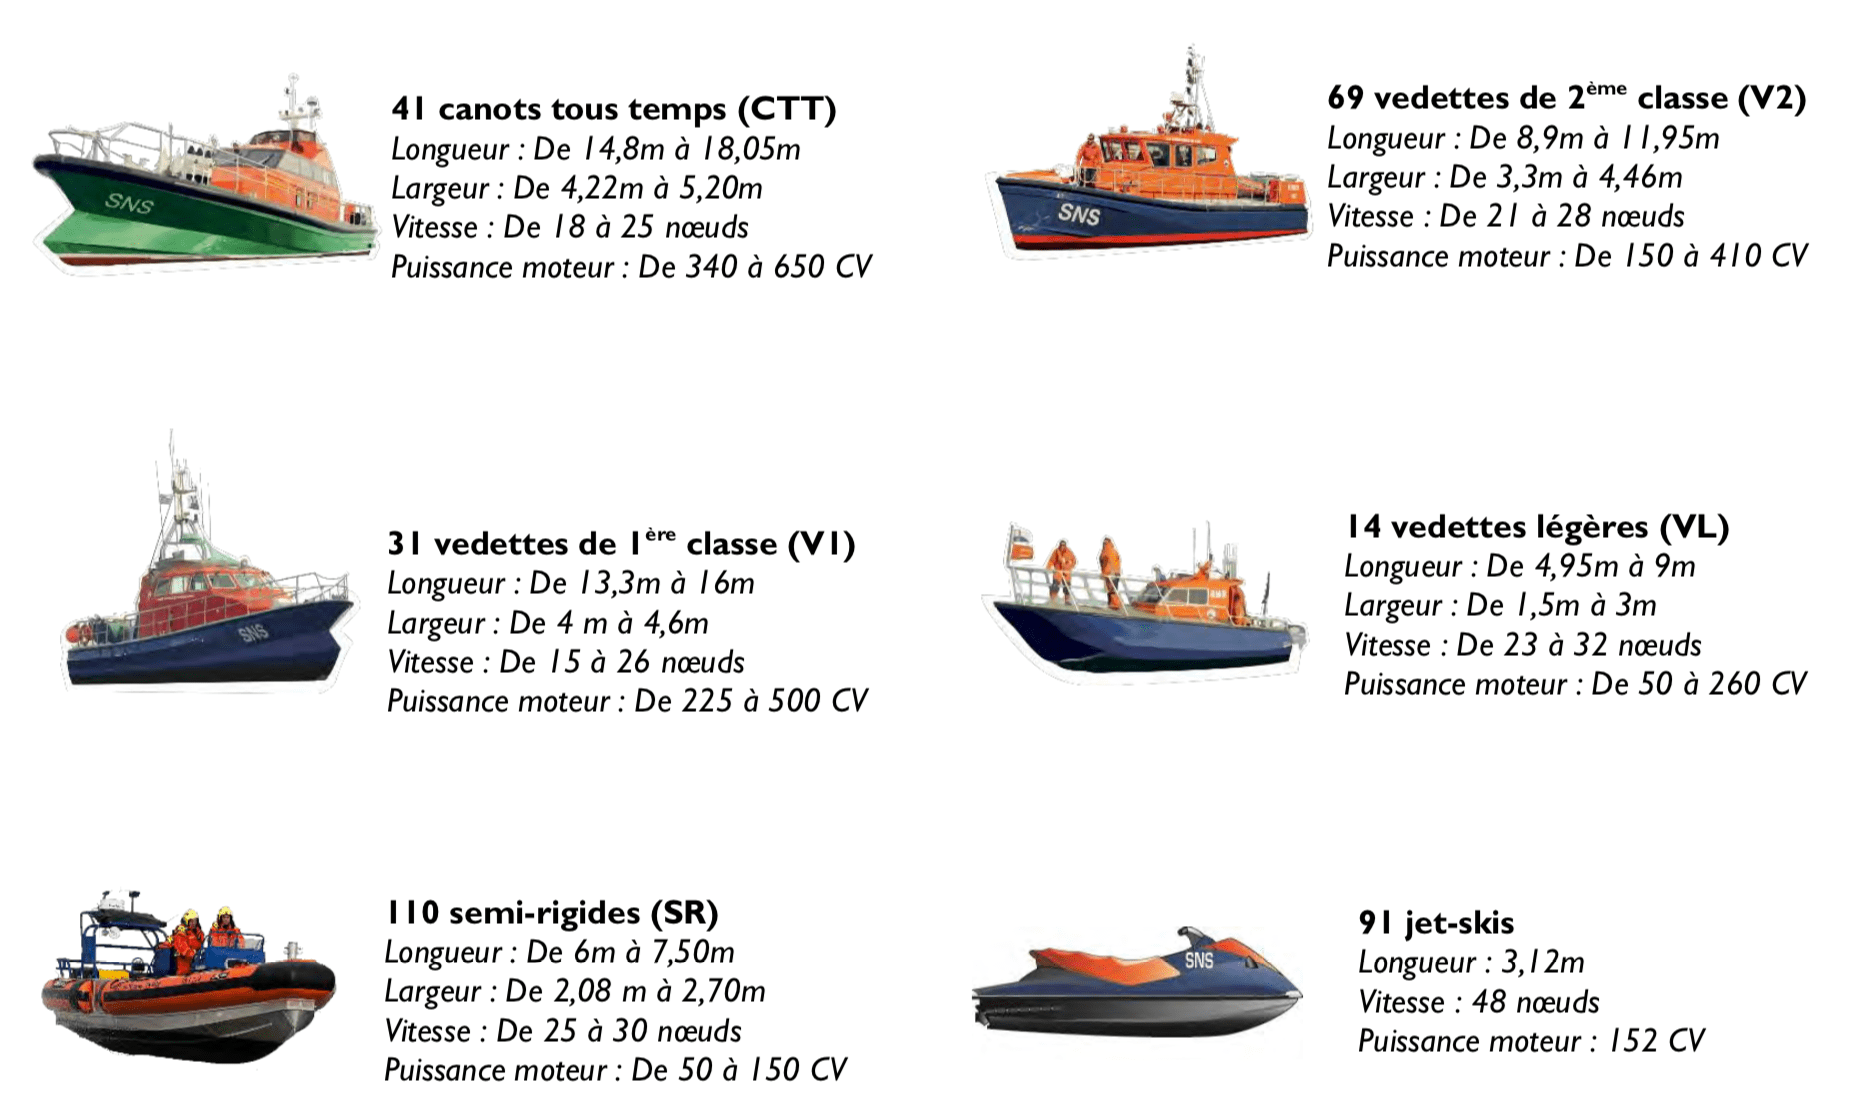 Flotte de la SNSM